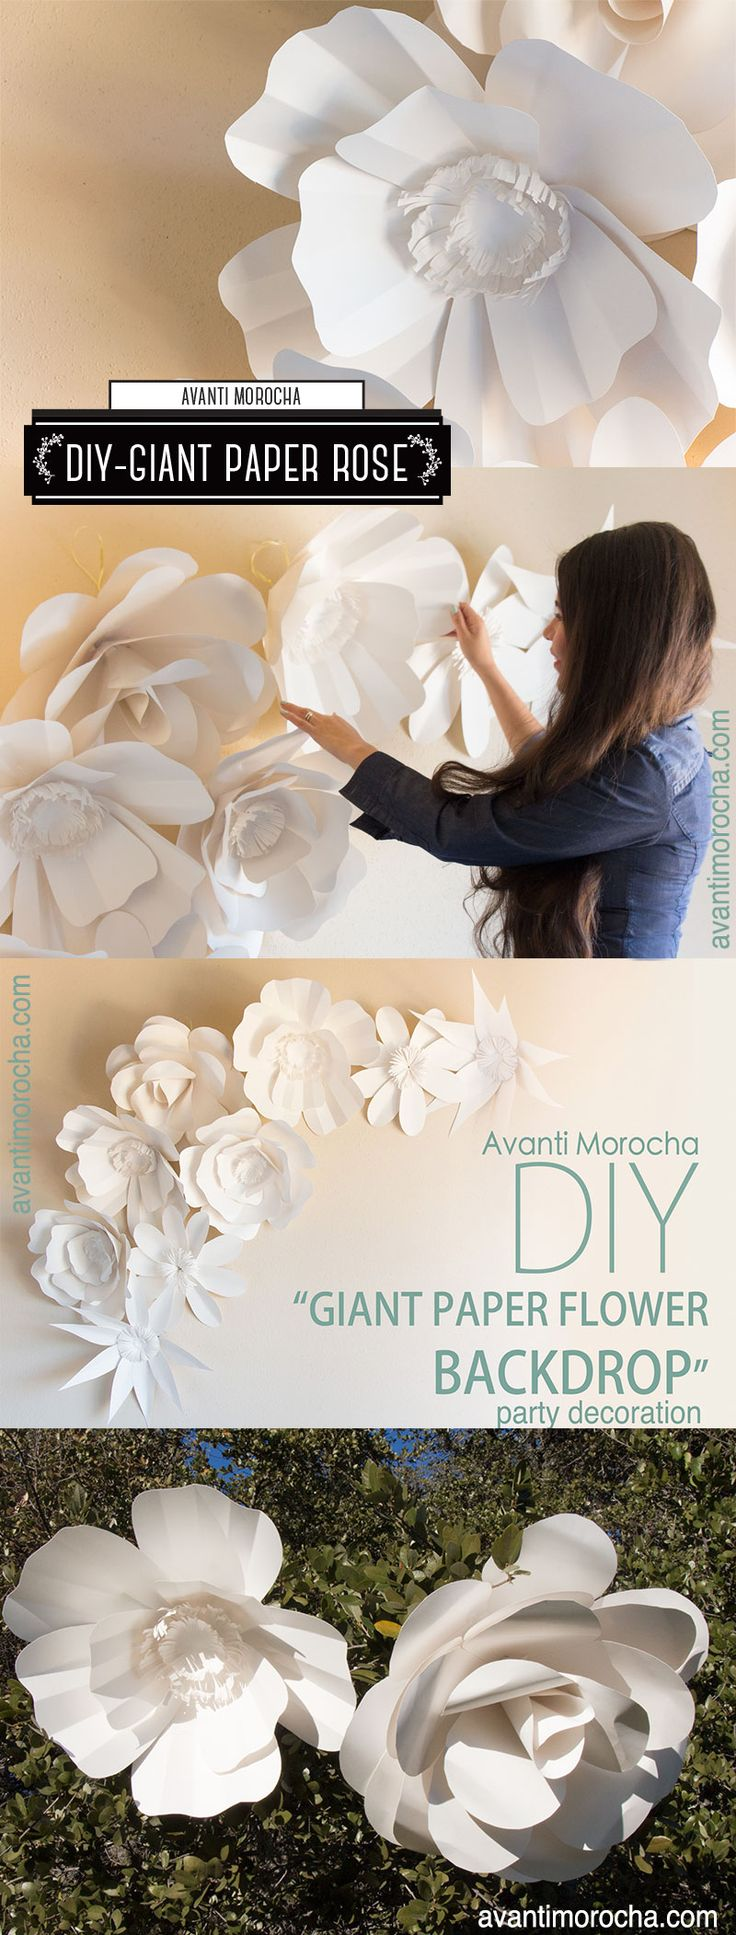 DIY Giant Paper Flower Backdrop / Weddings / Bodas / Mural de Flores Gigantes.